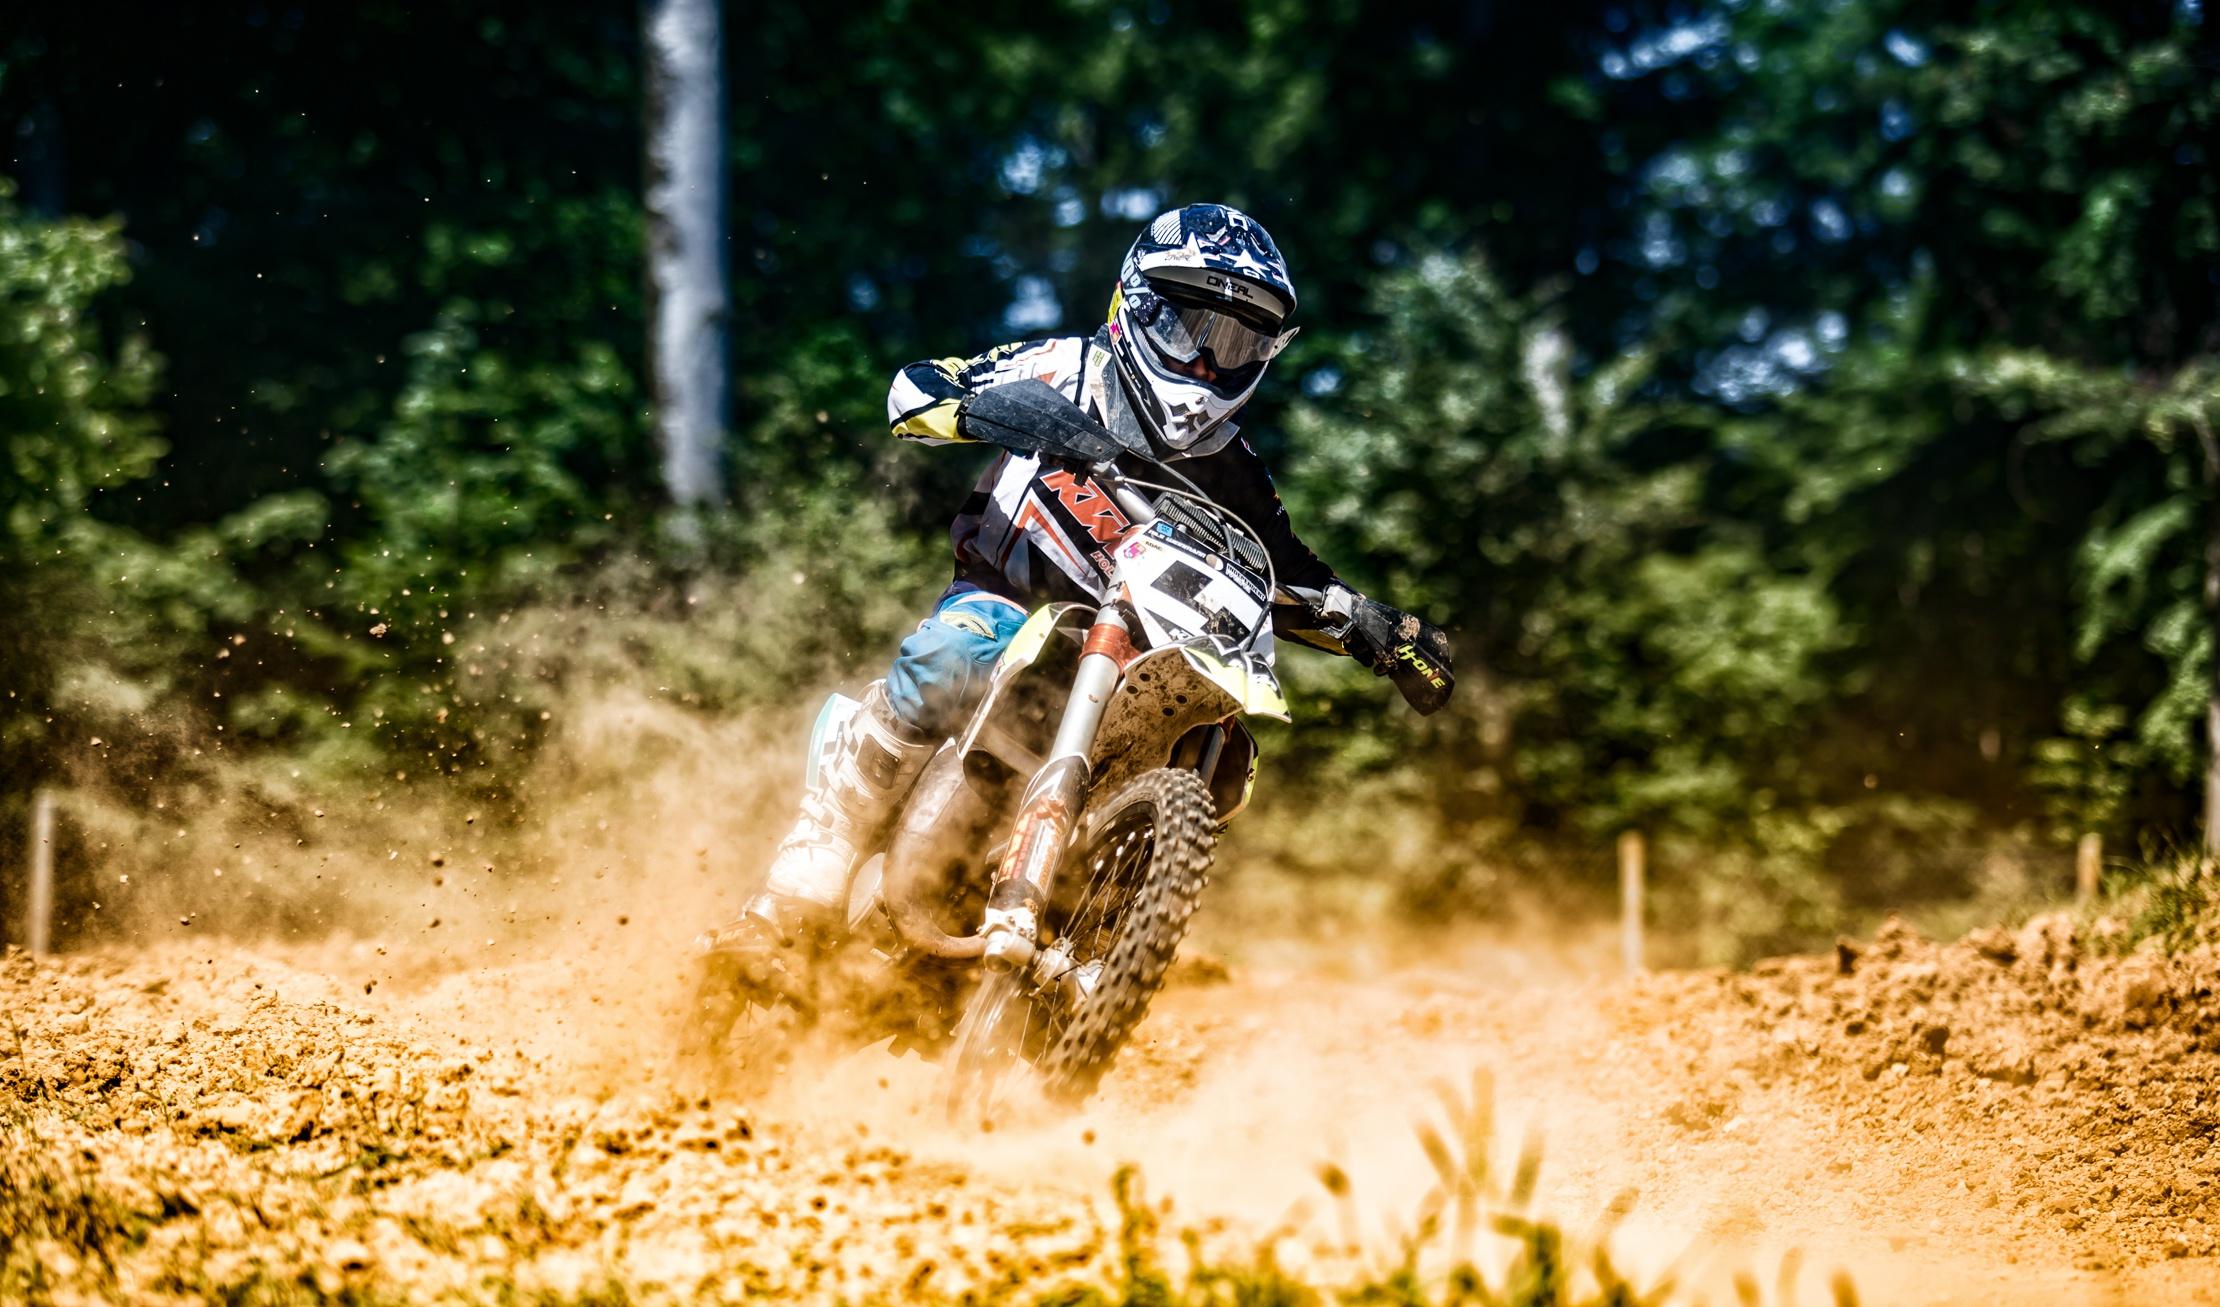 Motocross: Depth Of Field, Motorcycle, Motocross